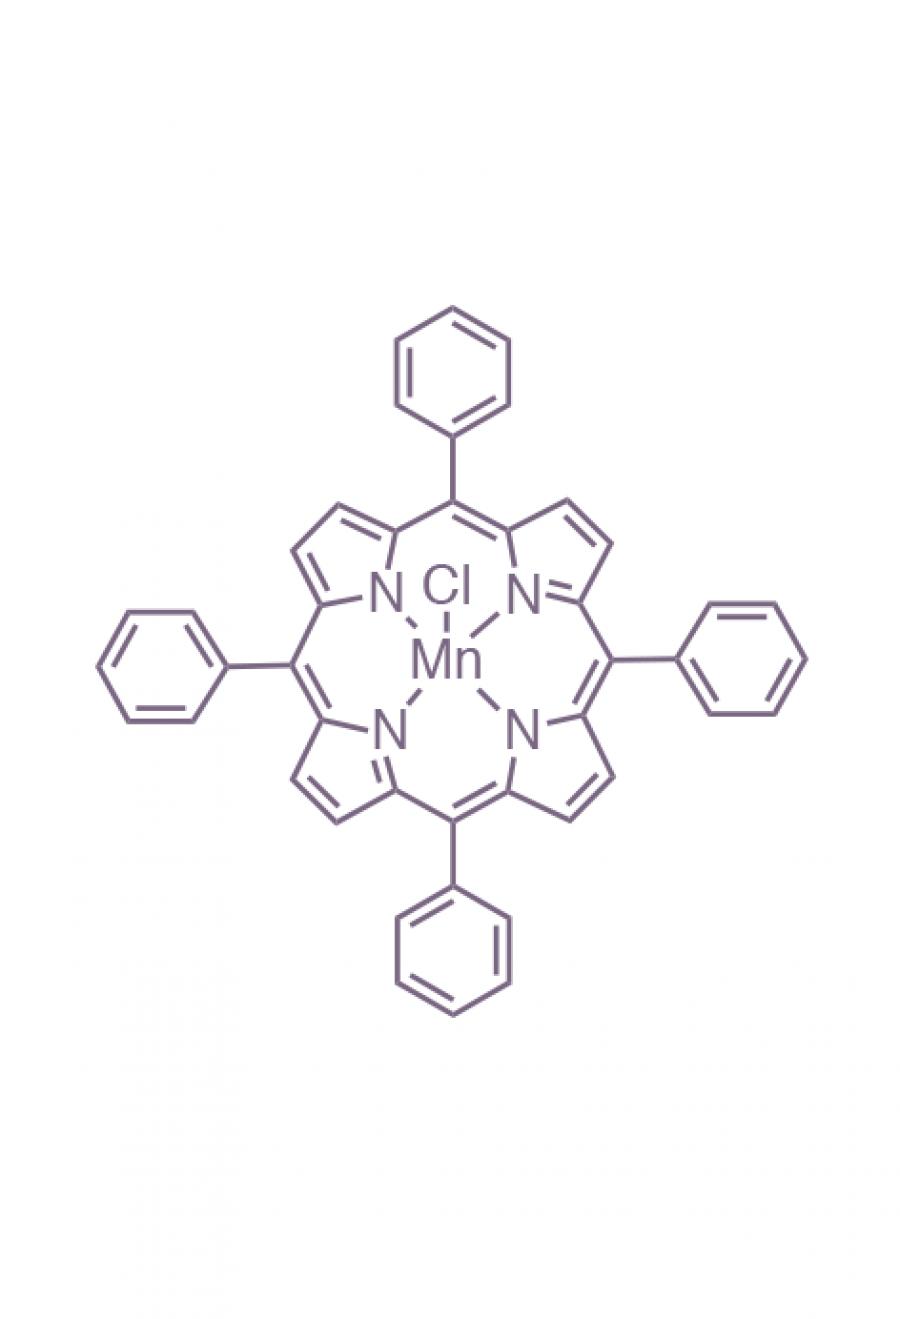 manganese(III) 5,10,15,20-(tetraphenyl)porphyrin chloride